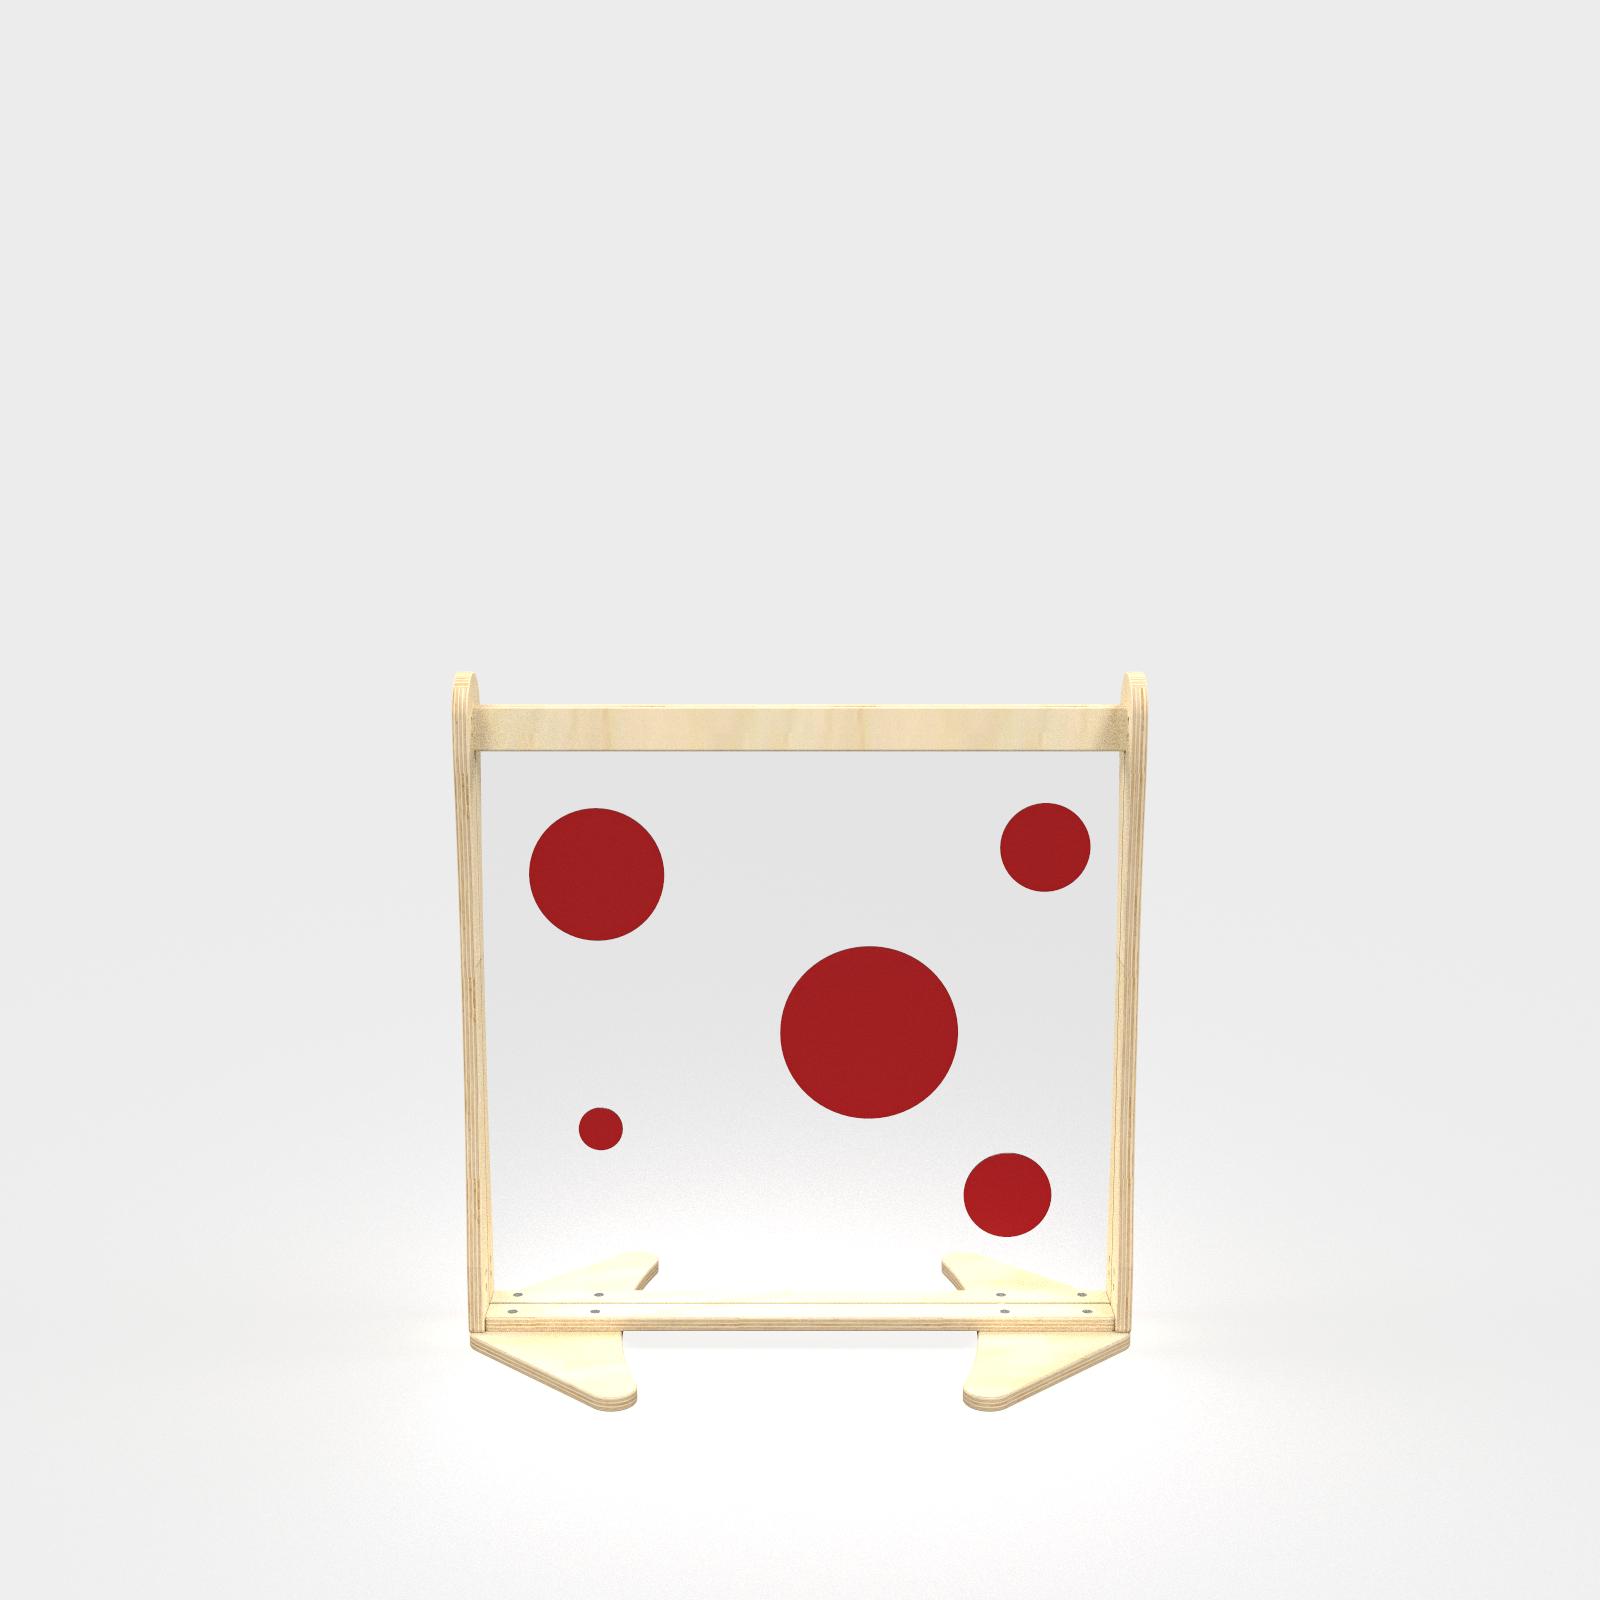 pannelli_divisori_asilo_nido_plexiglass